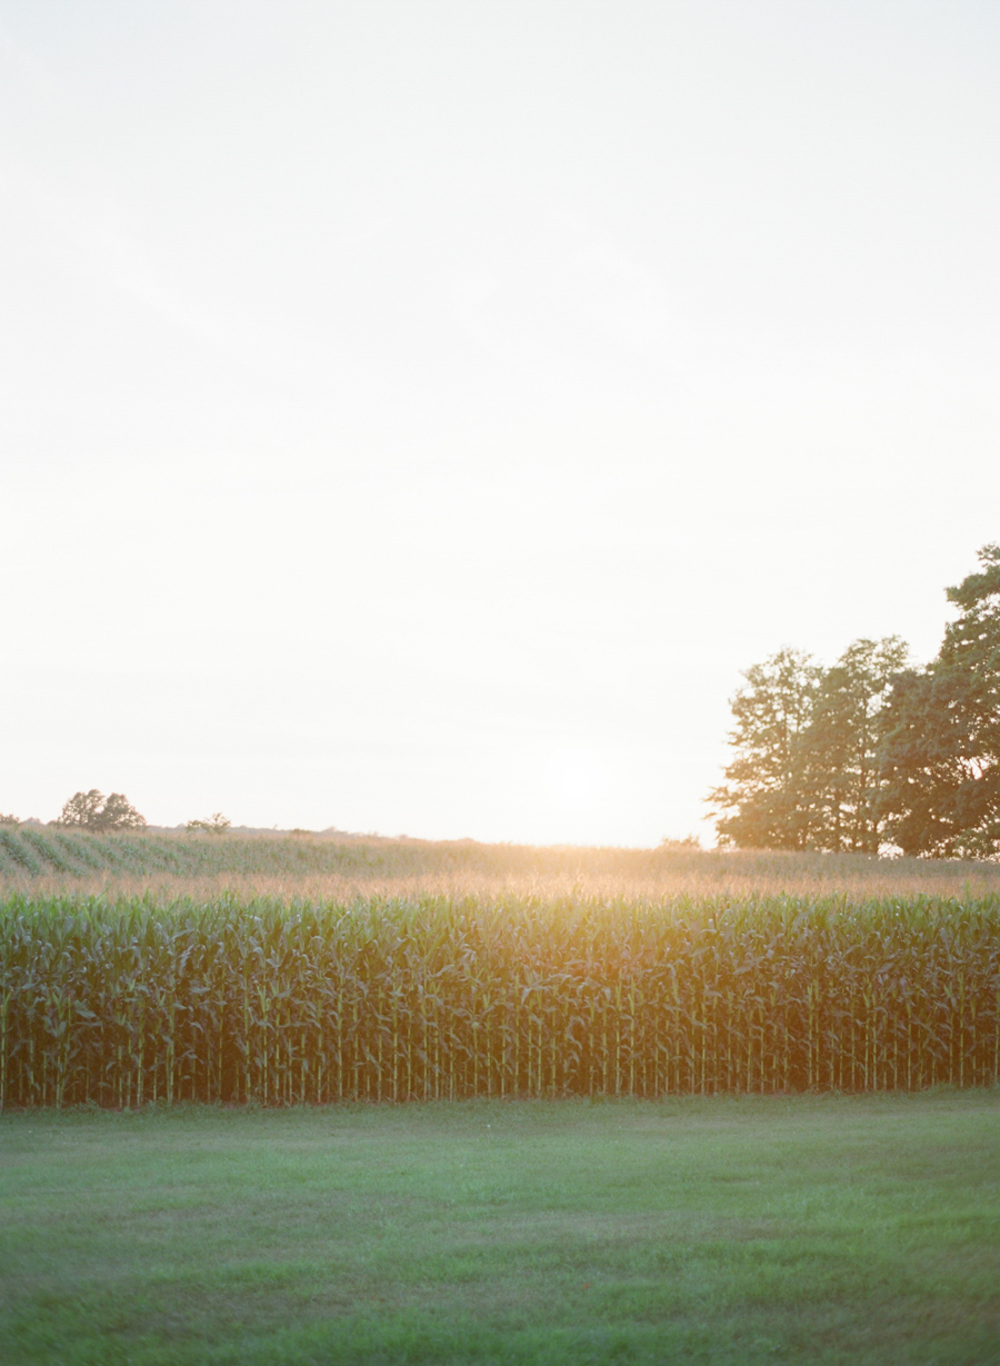 About_Thyme_Farm_Door_County_Wedding_047.jpg